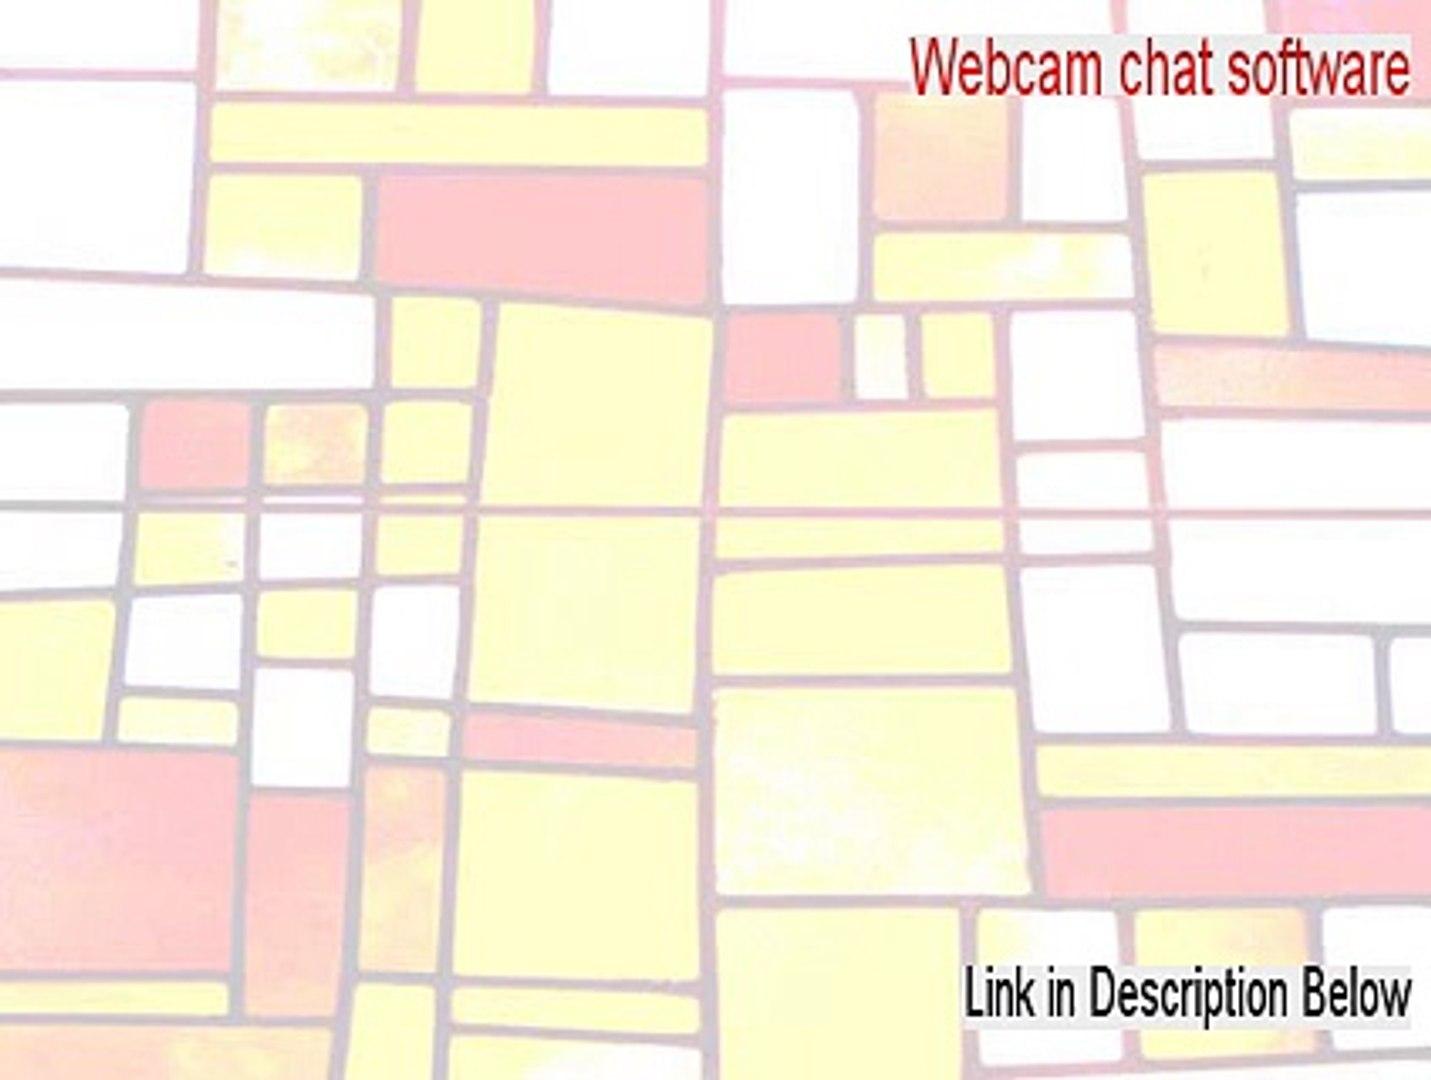 Webcam chat software Full - Webcam chat software